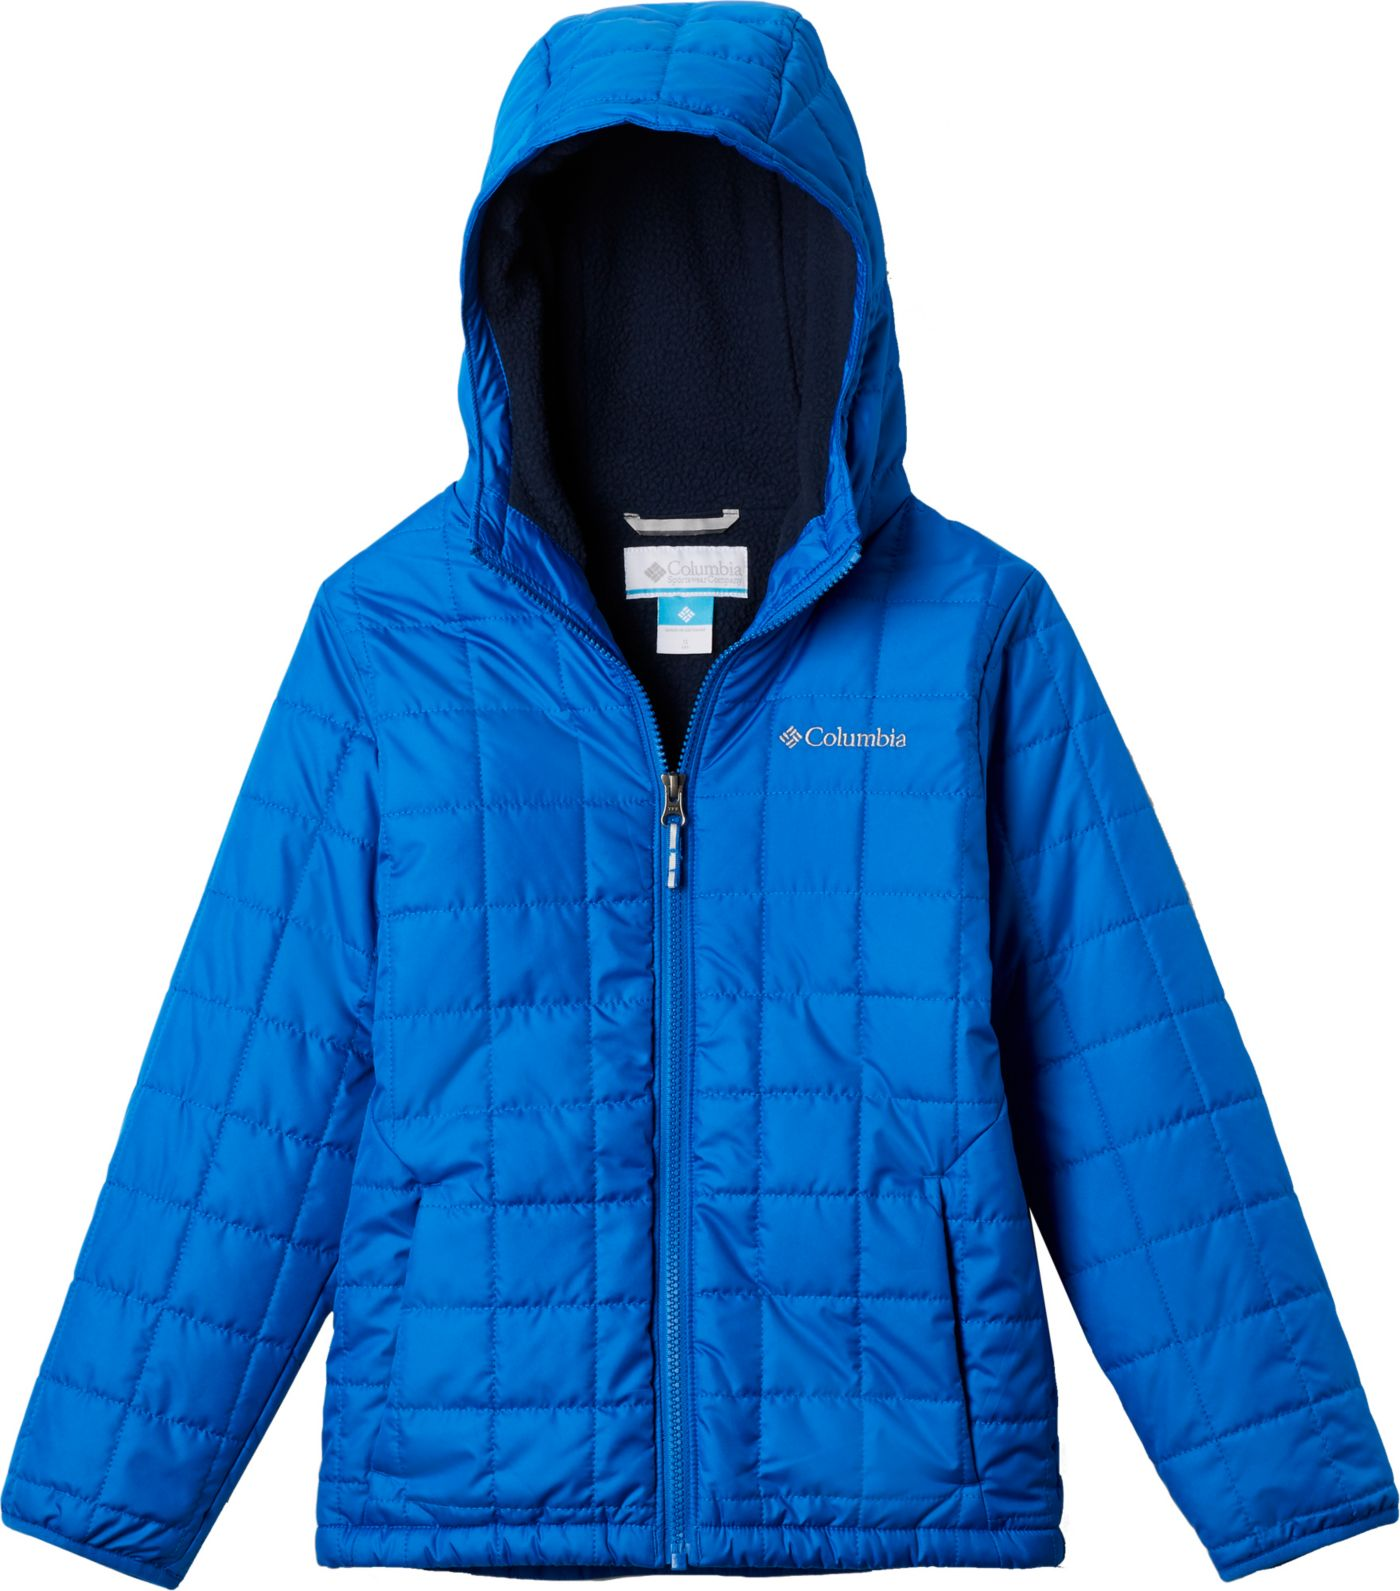 Columbia Boys' Rugged Ridge Sherpa Lined Jacket